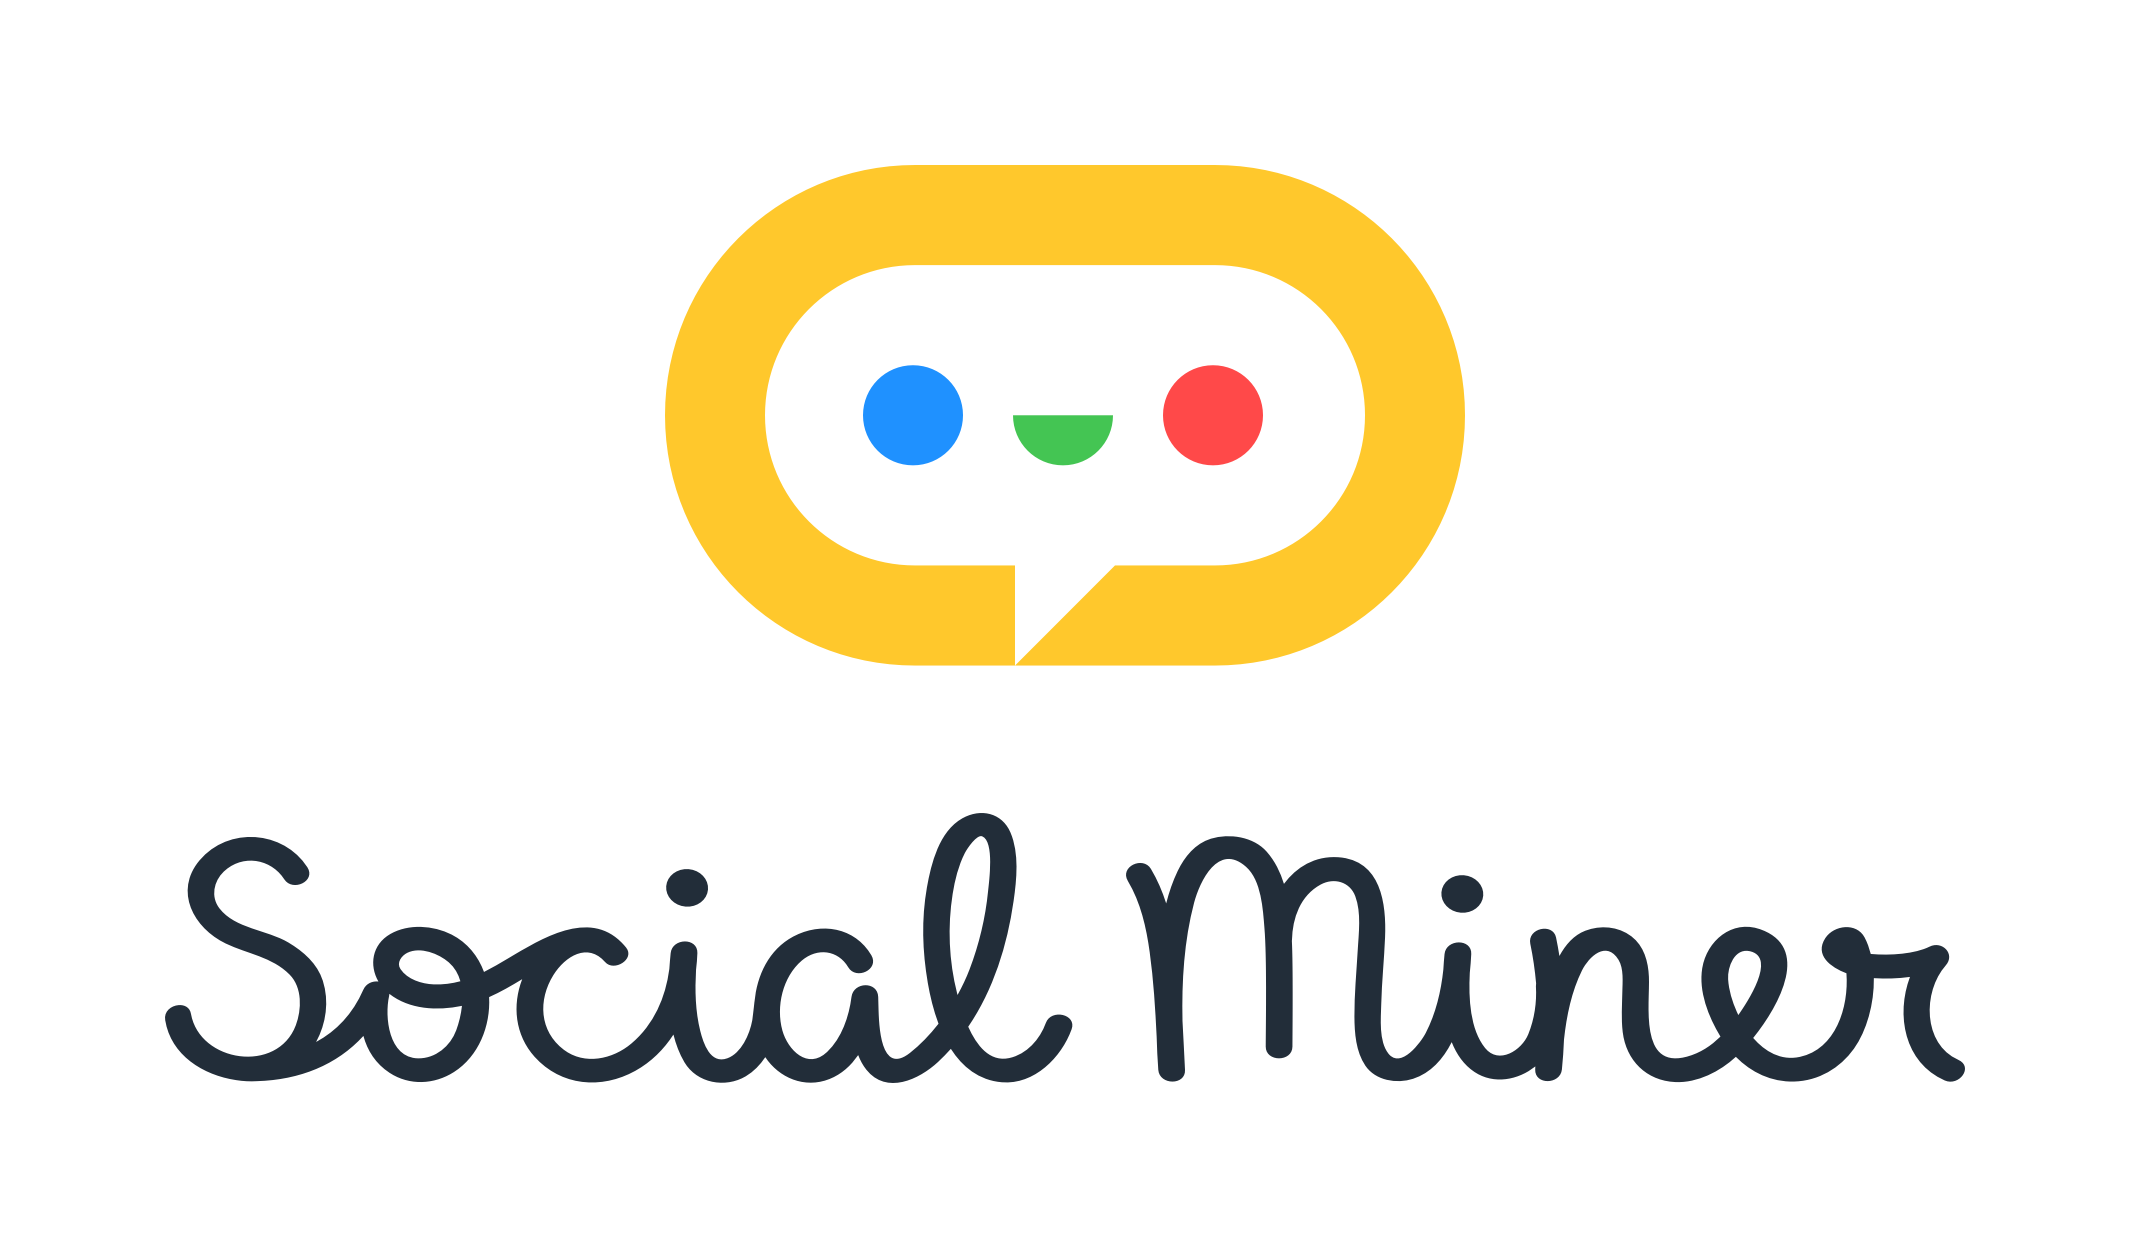 Resultado de imagem para social miner logo png